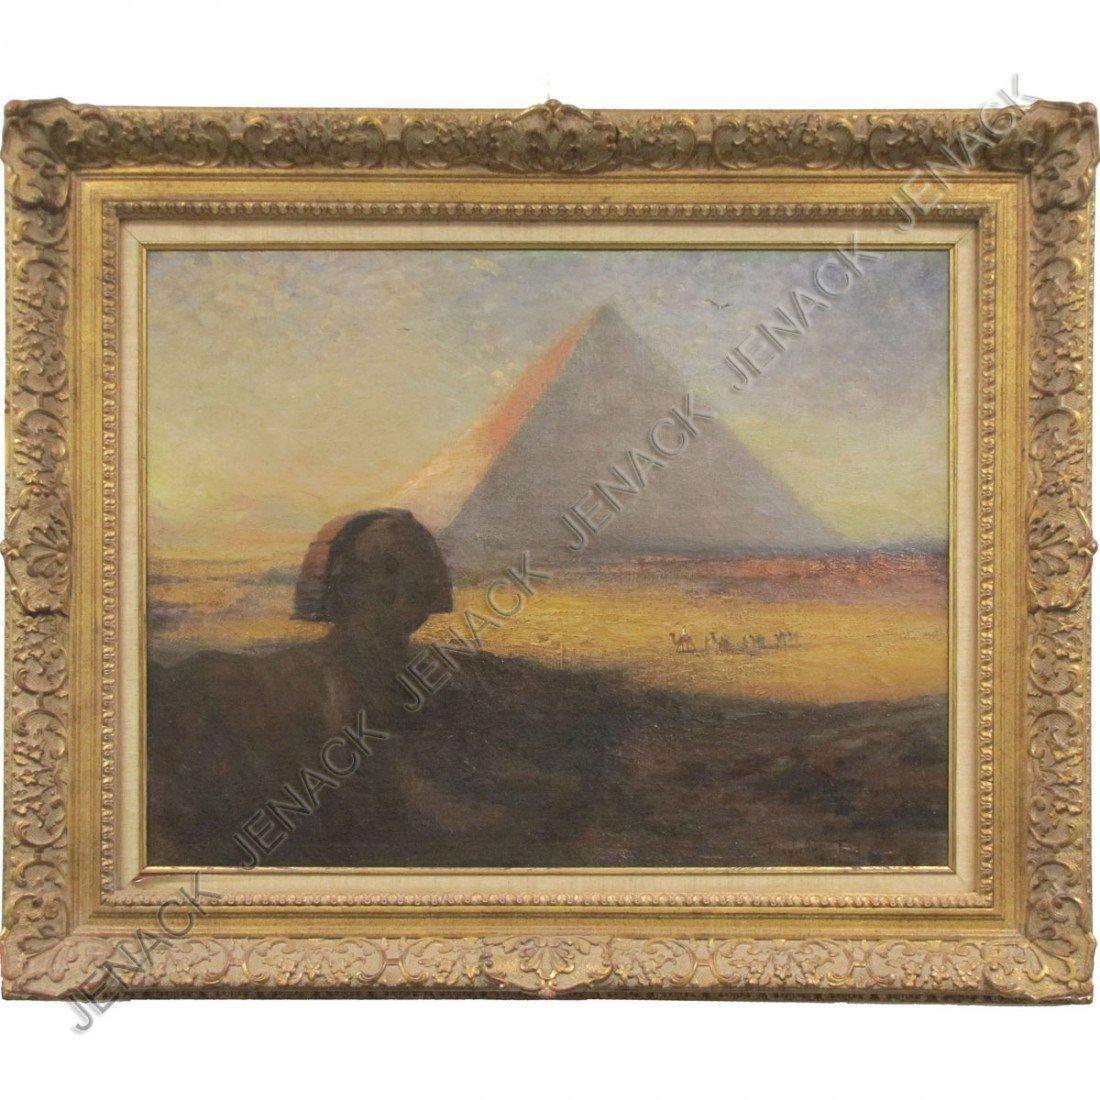 155: DOUGLAS ARTHUR TEED (AMERICAN 1864-1929), OIL